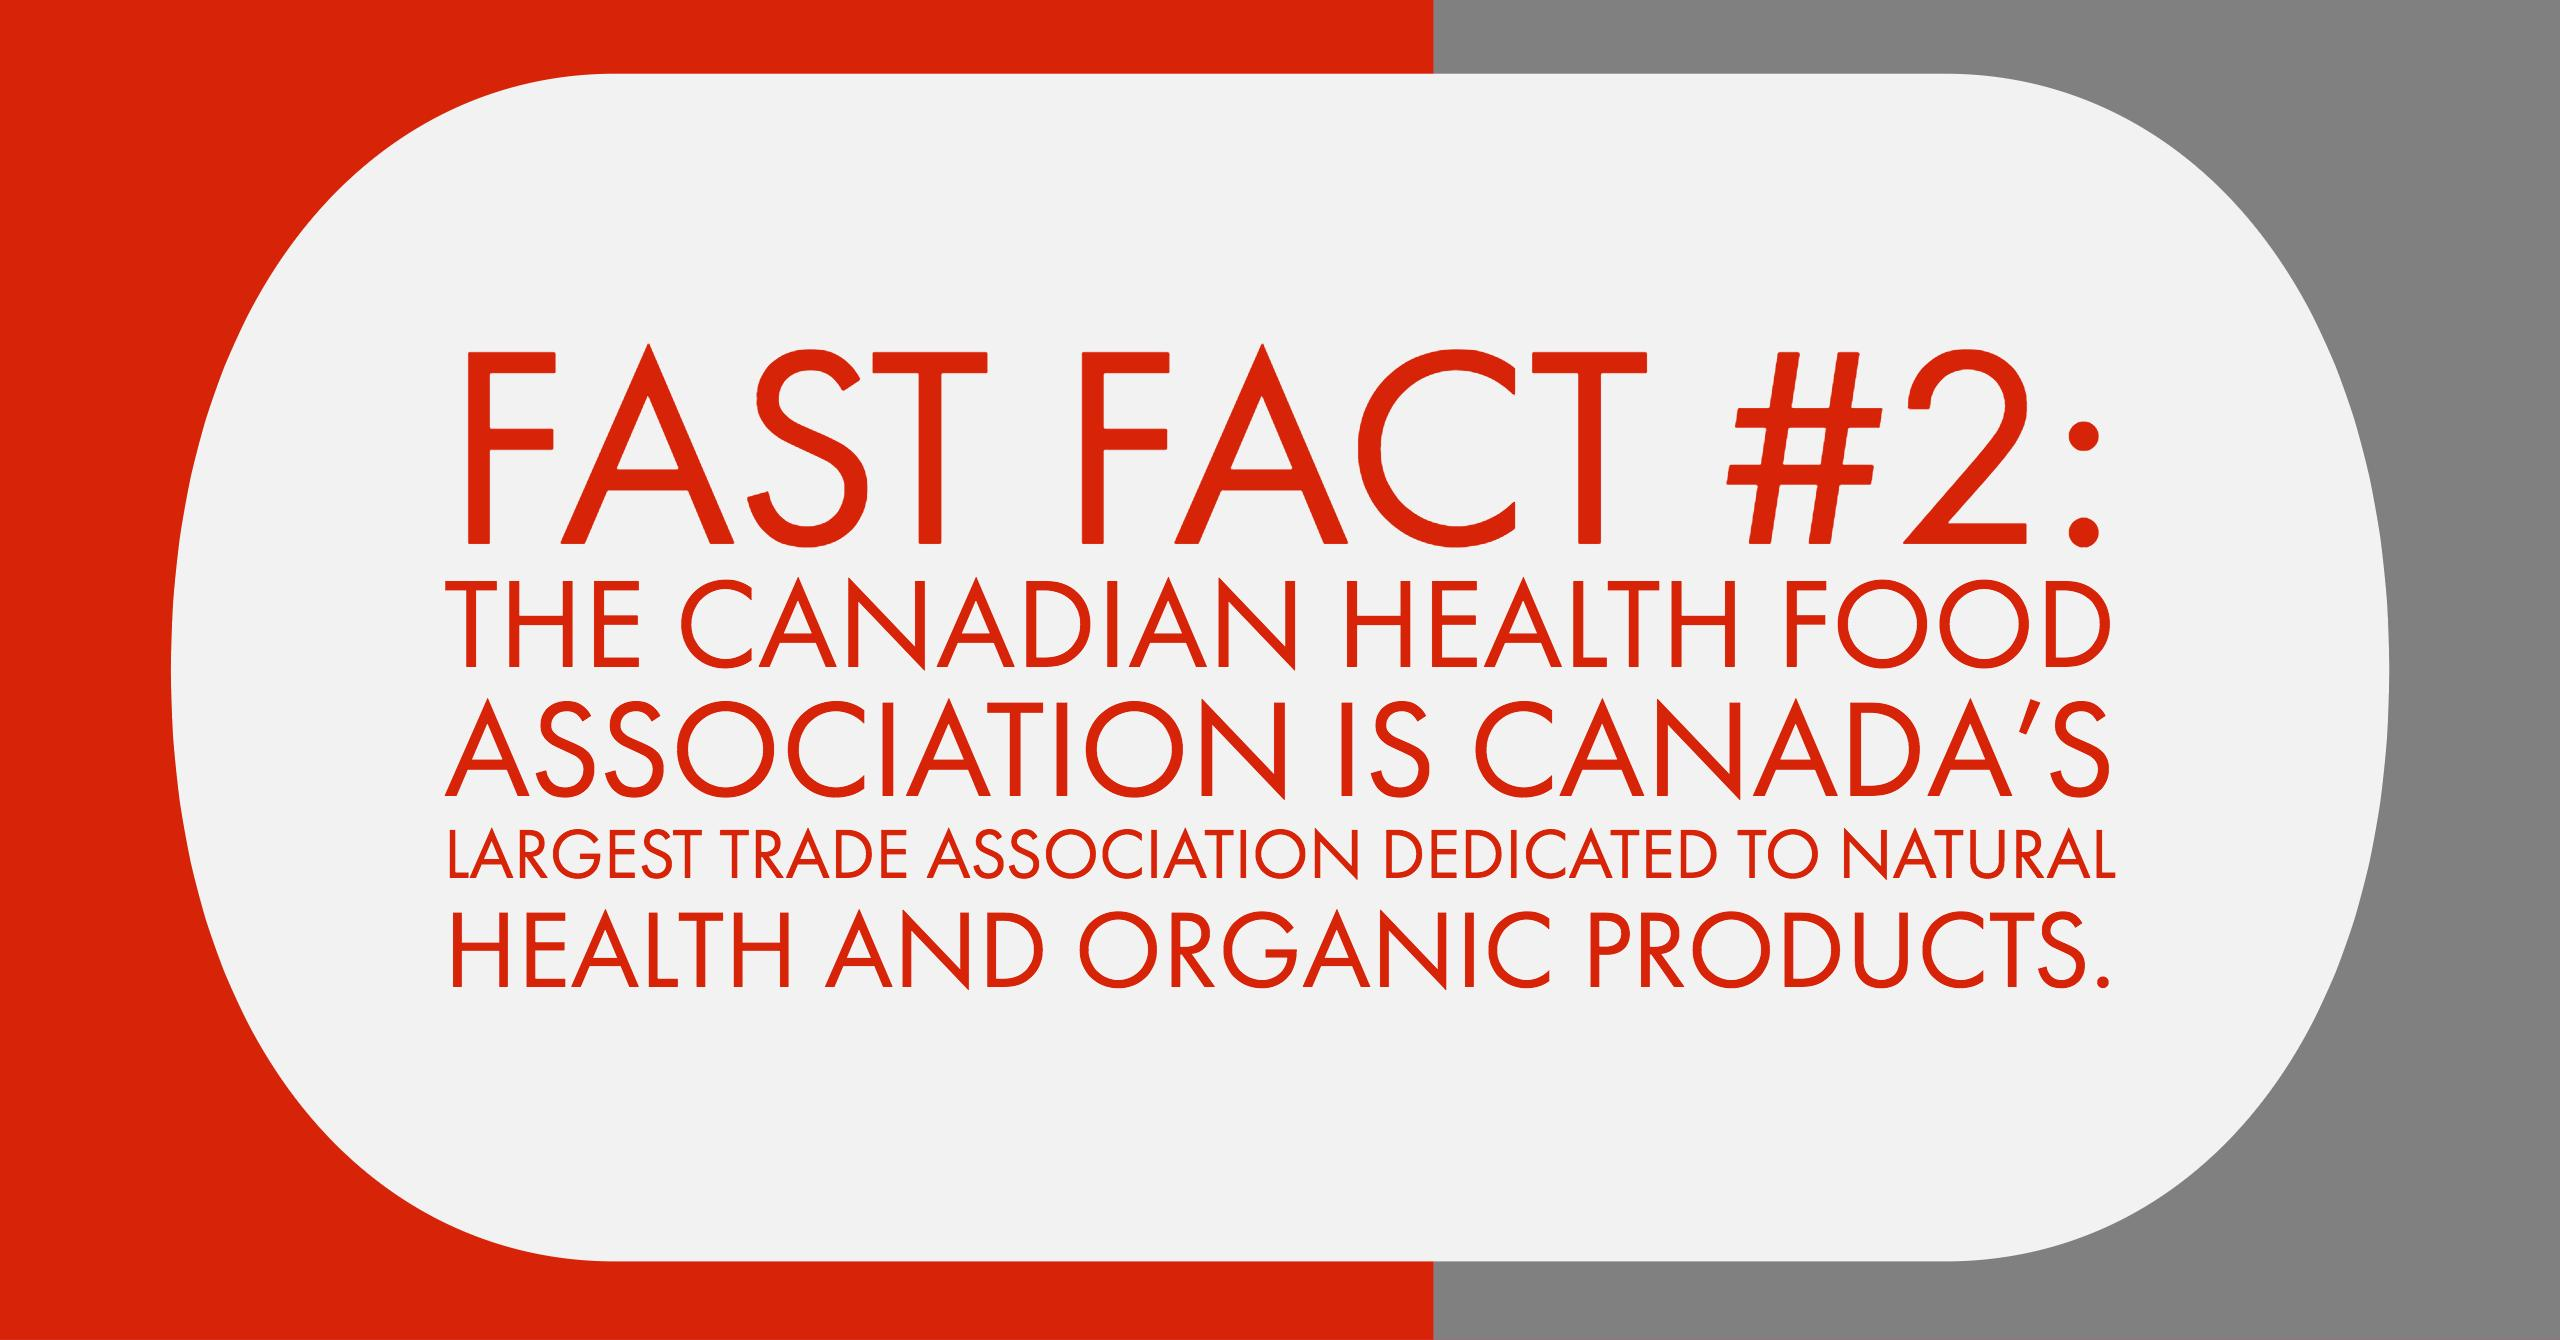 FastFact#2 Canadian Health Food Association